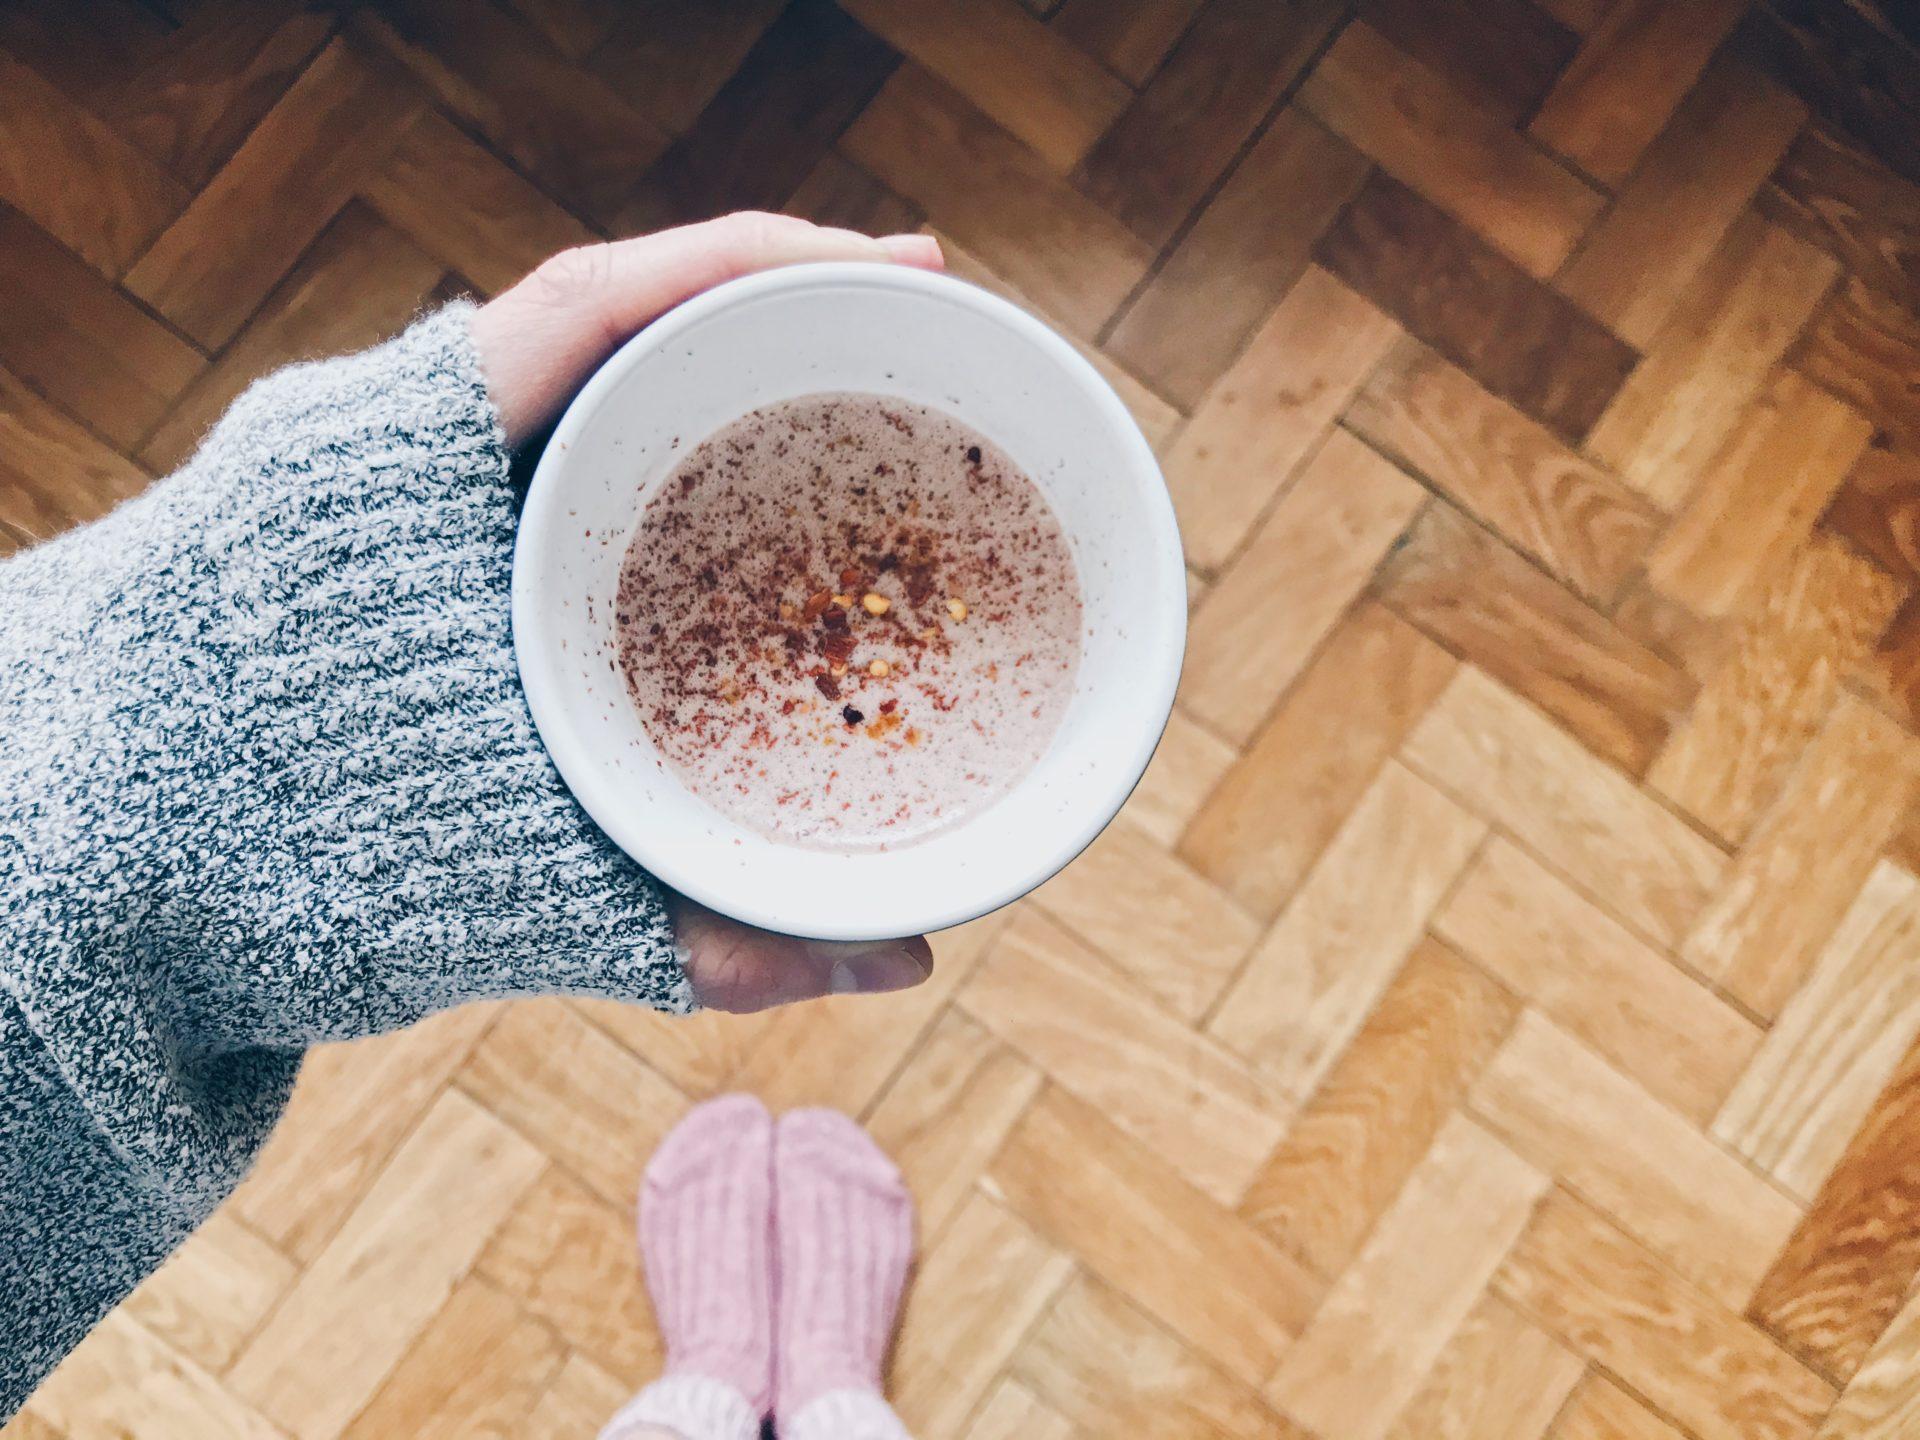 kakao, ponožky, svetr, hygge, čili, mexiko, ráno, vstávání, horký nápoj, doma, odpočinek, únava